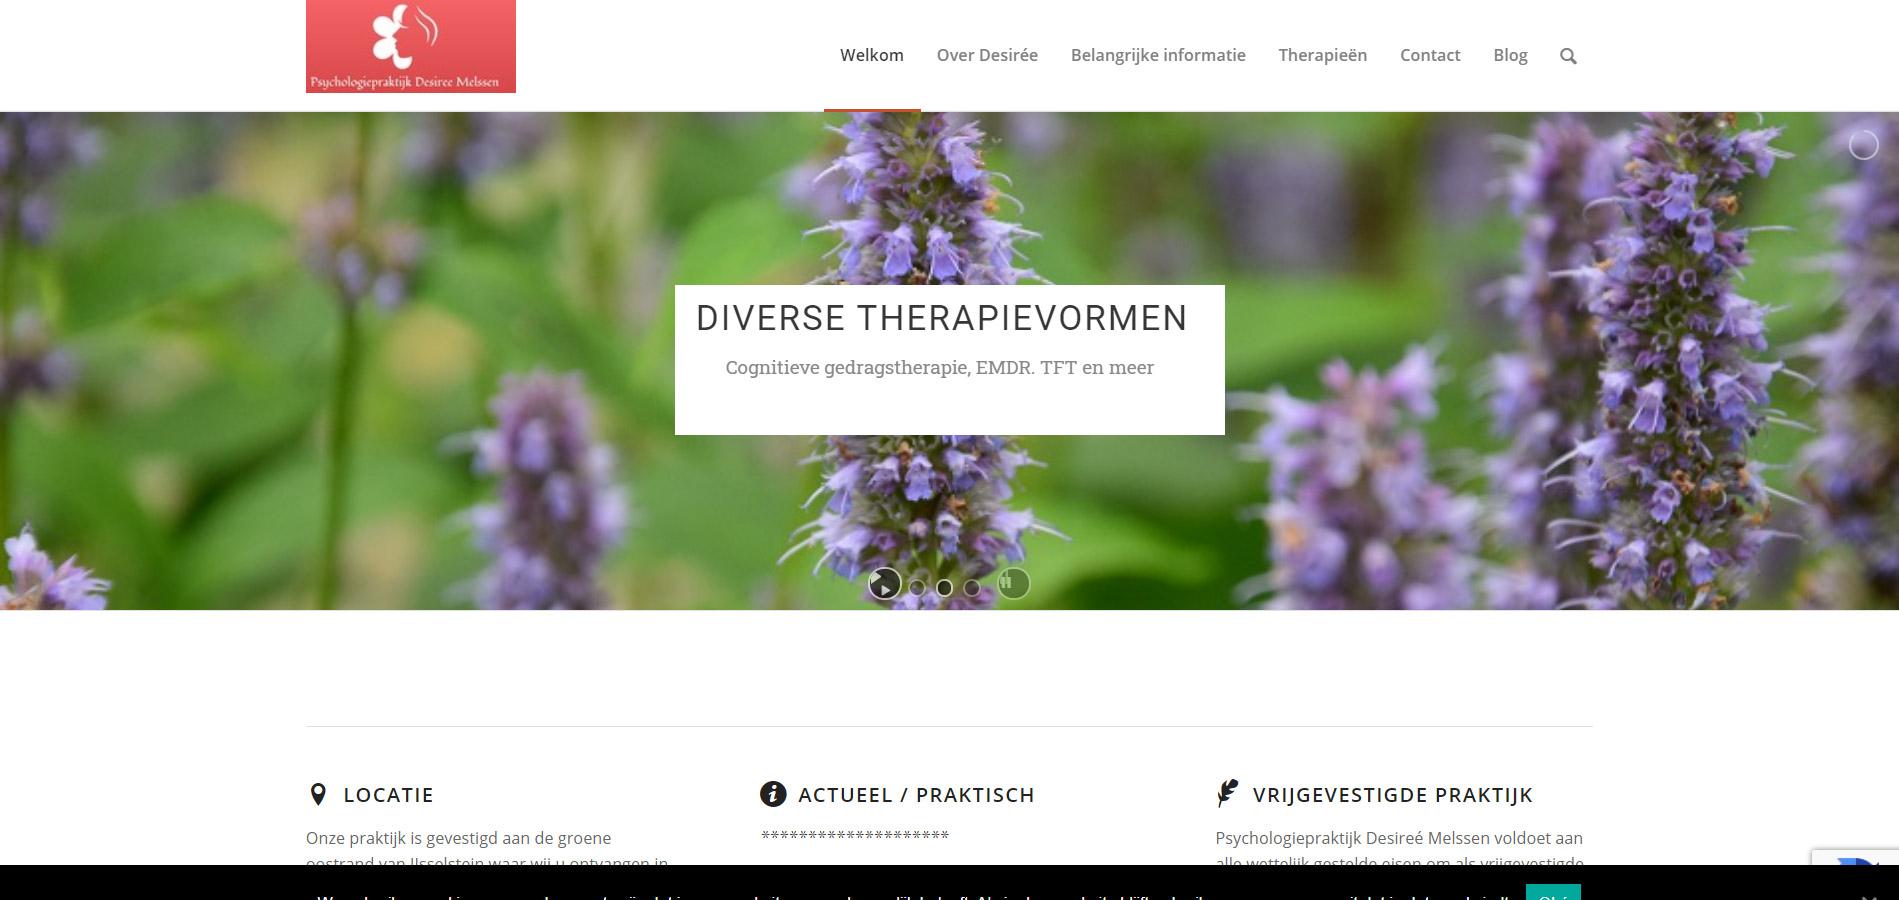 Website Psychologiepraktijk Desiree Melssen